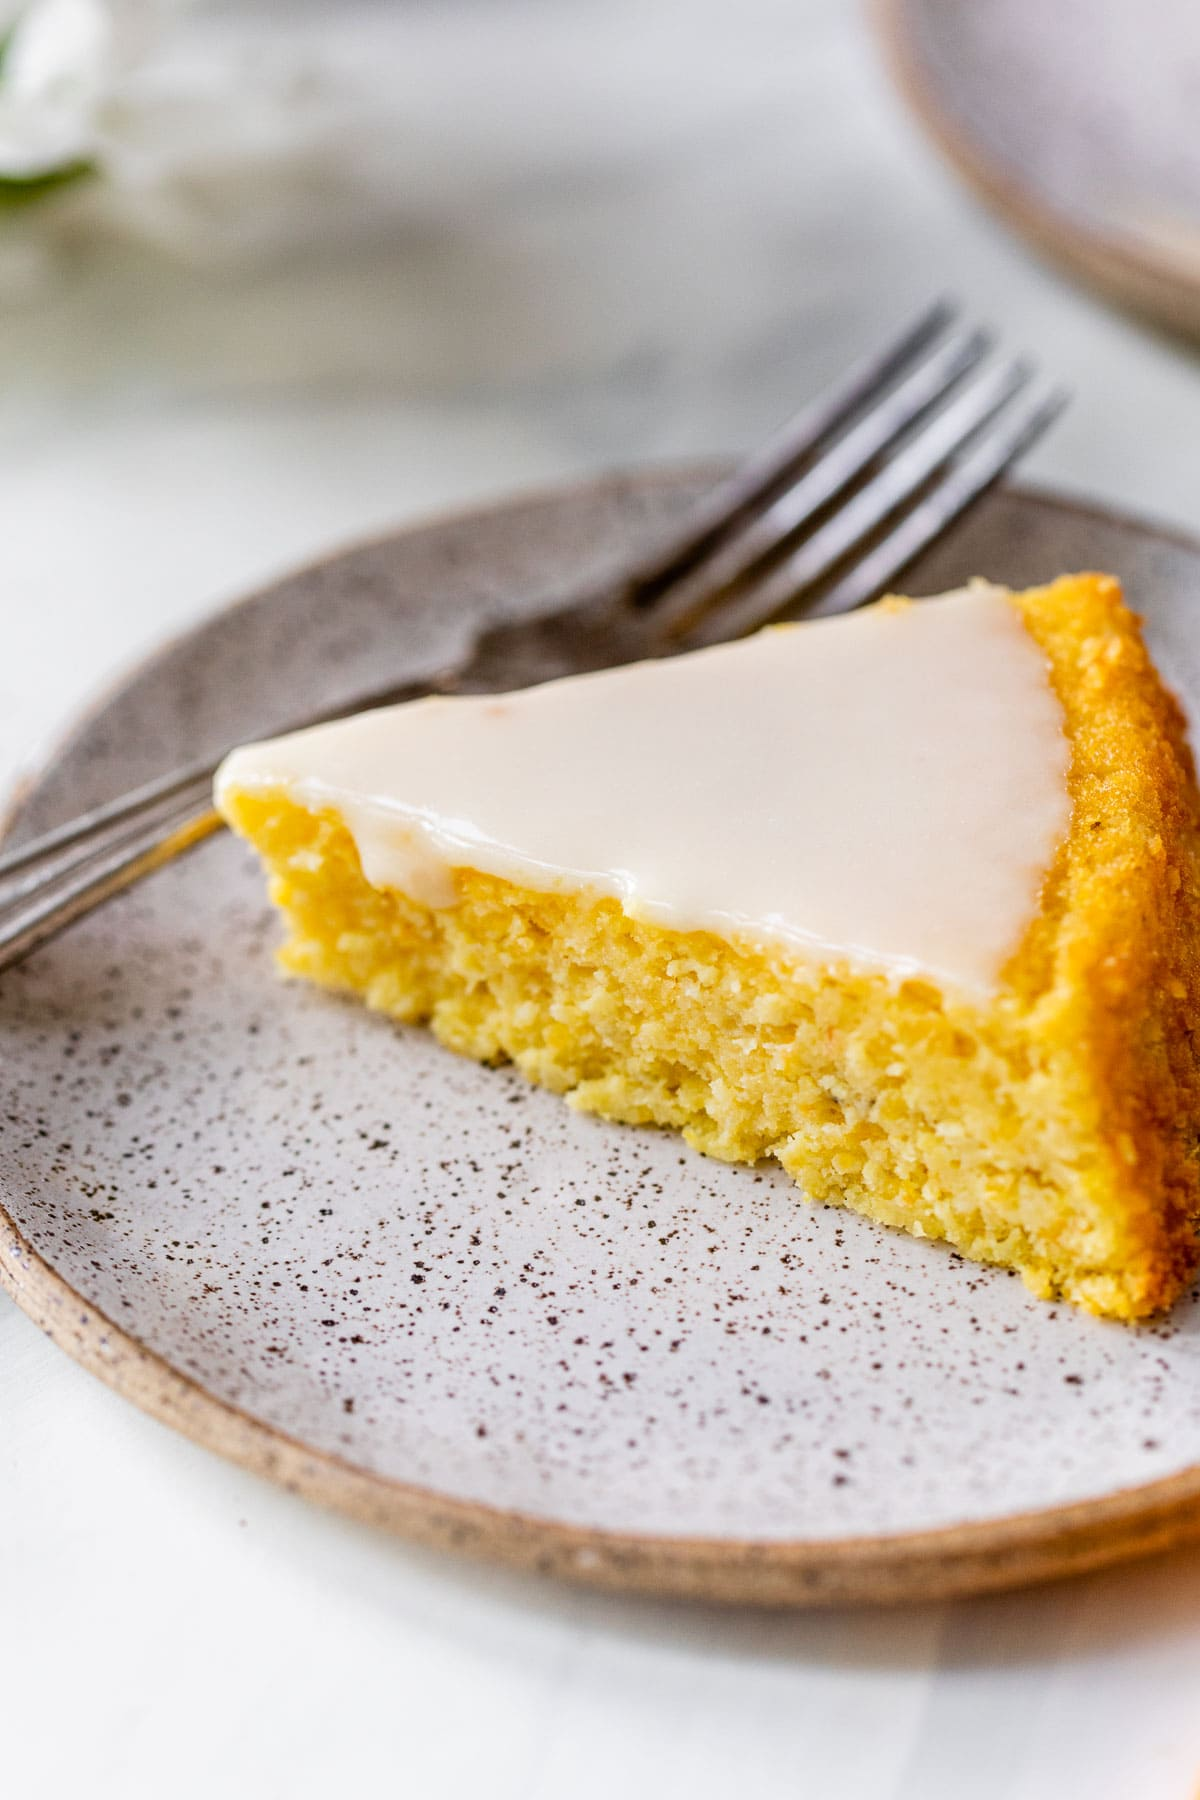 orange polenta cake on a plate